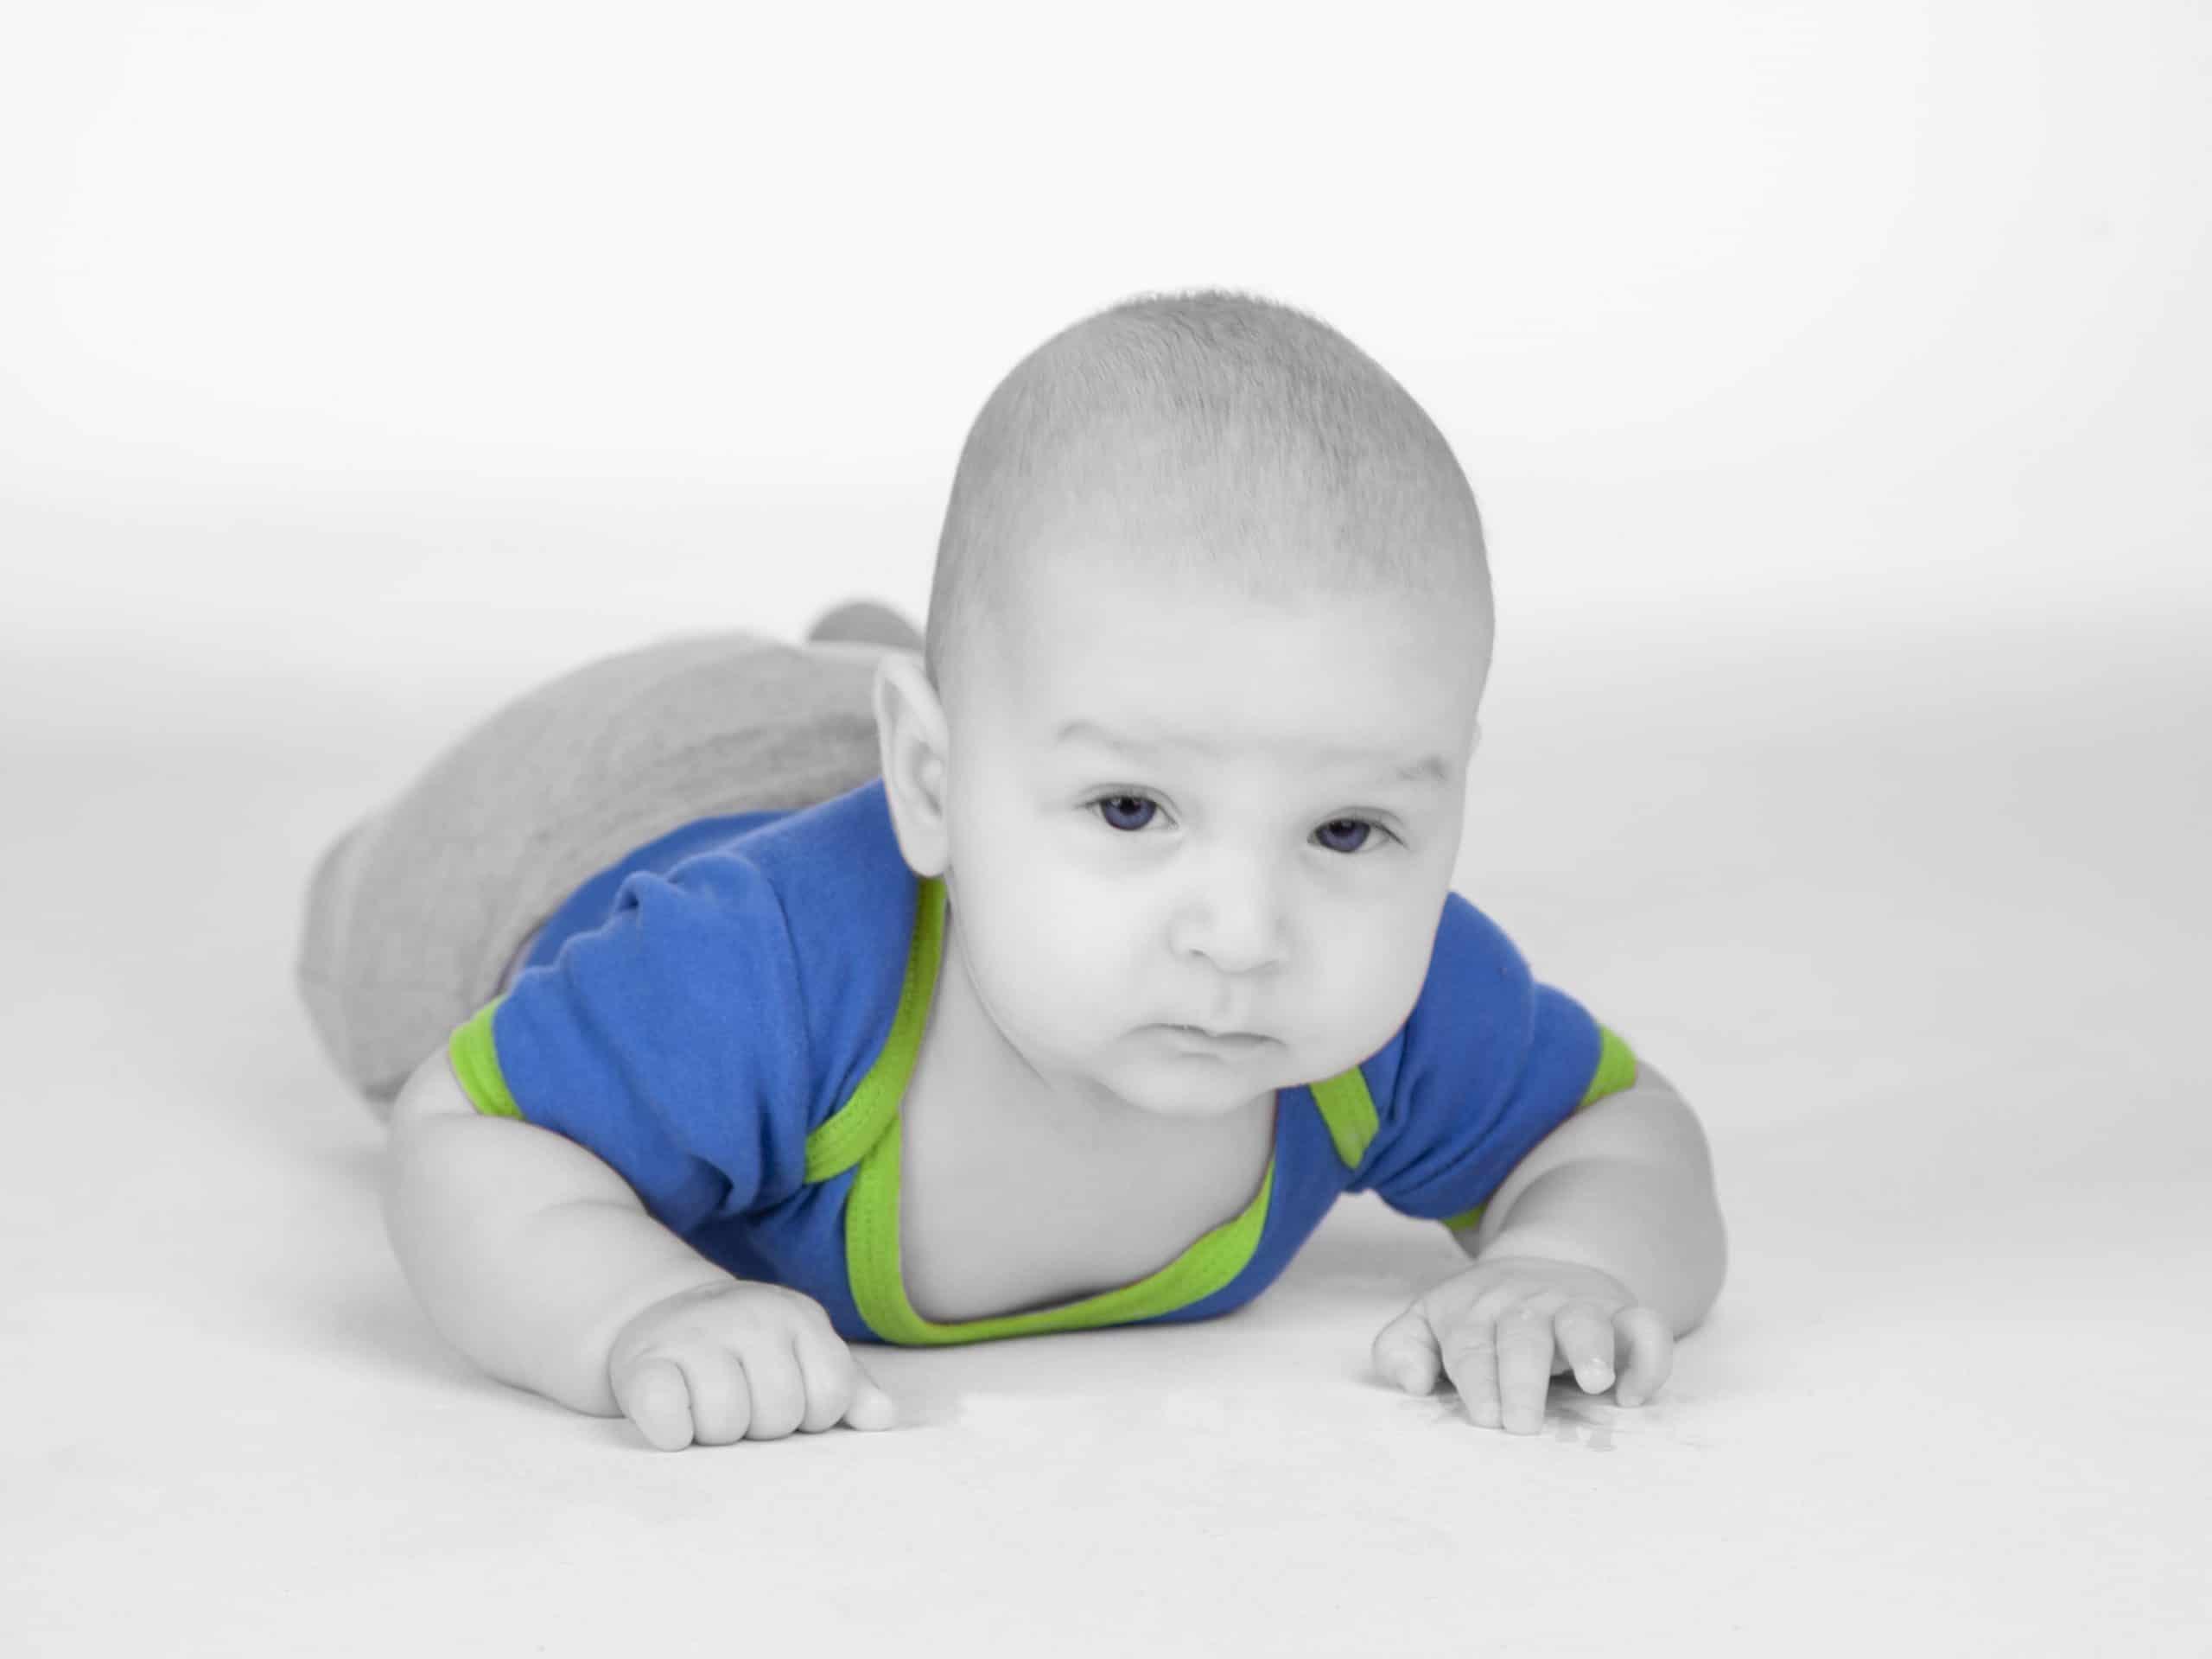 Babyfotos - Babyfotografie - Babyshooting Murnau Foto-Stoess-001